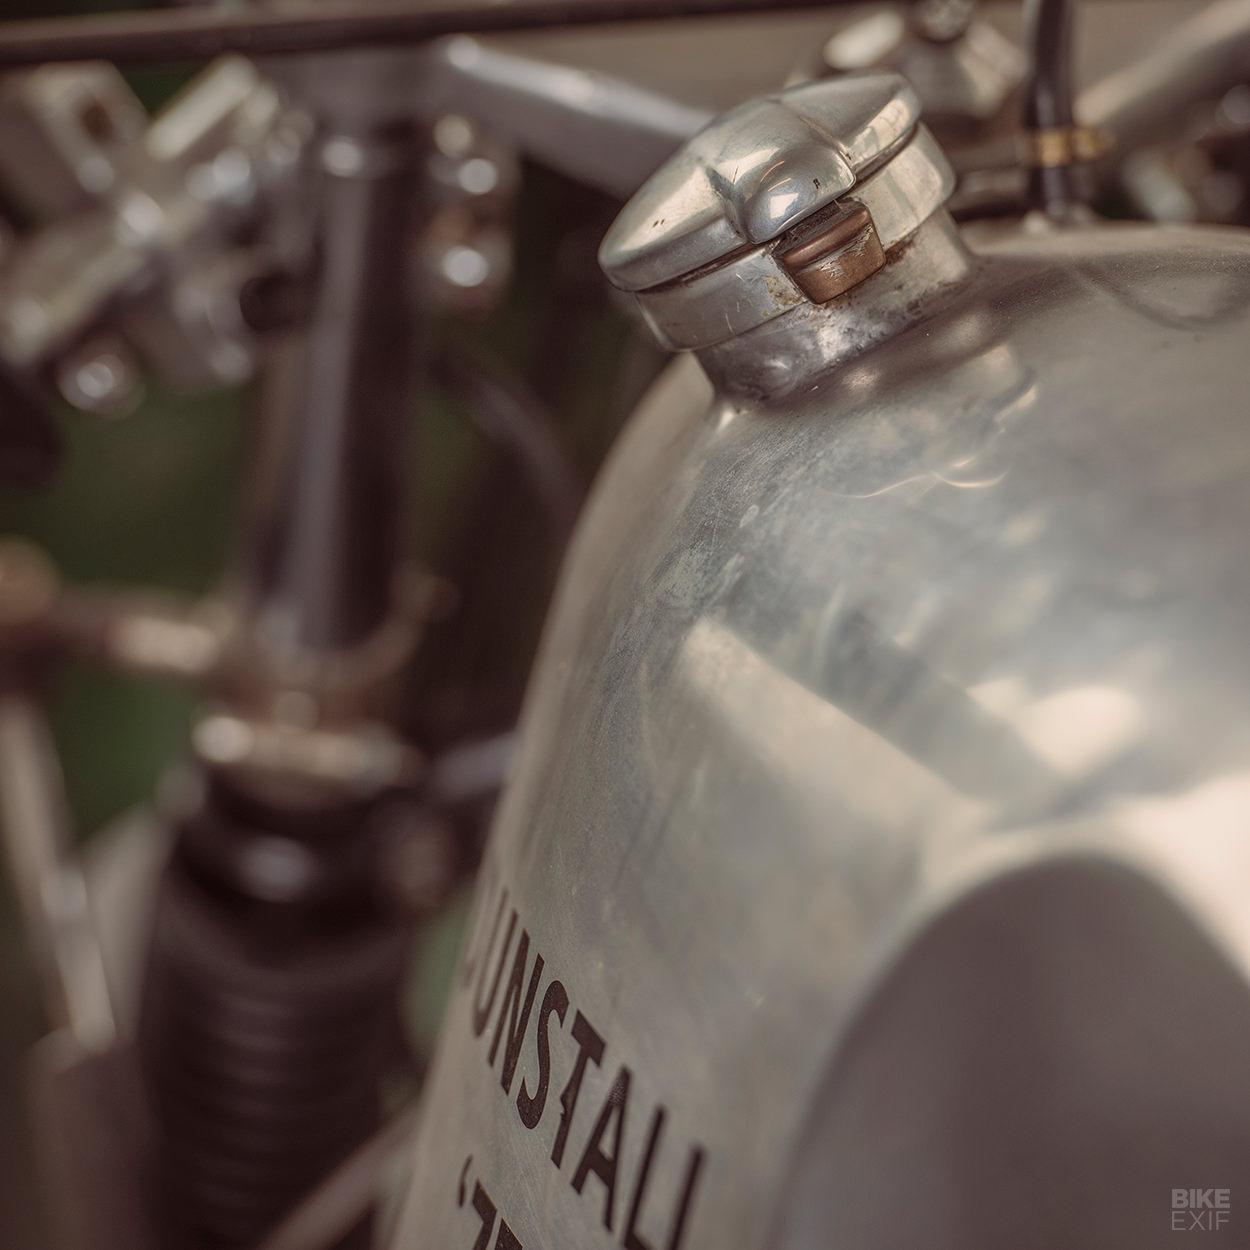 The rare Dunstall drainpipe Norton racing motorcycle